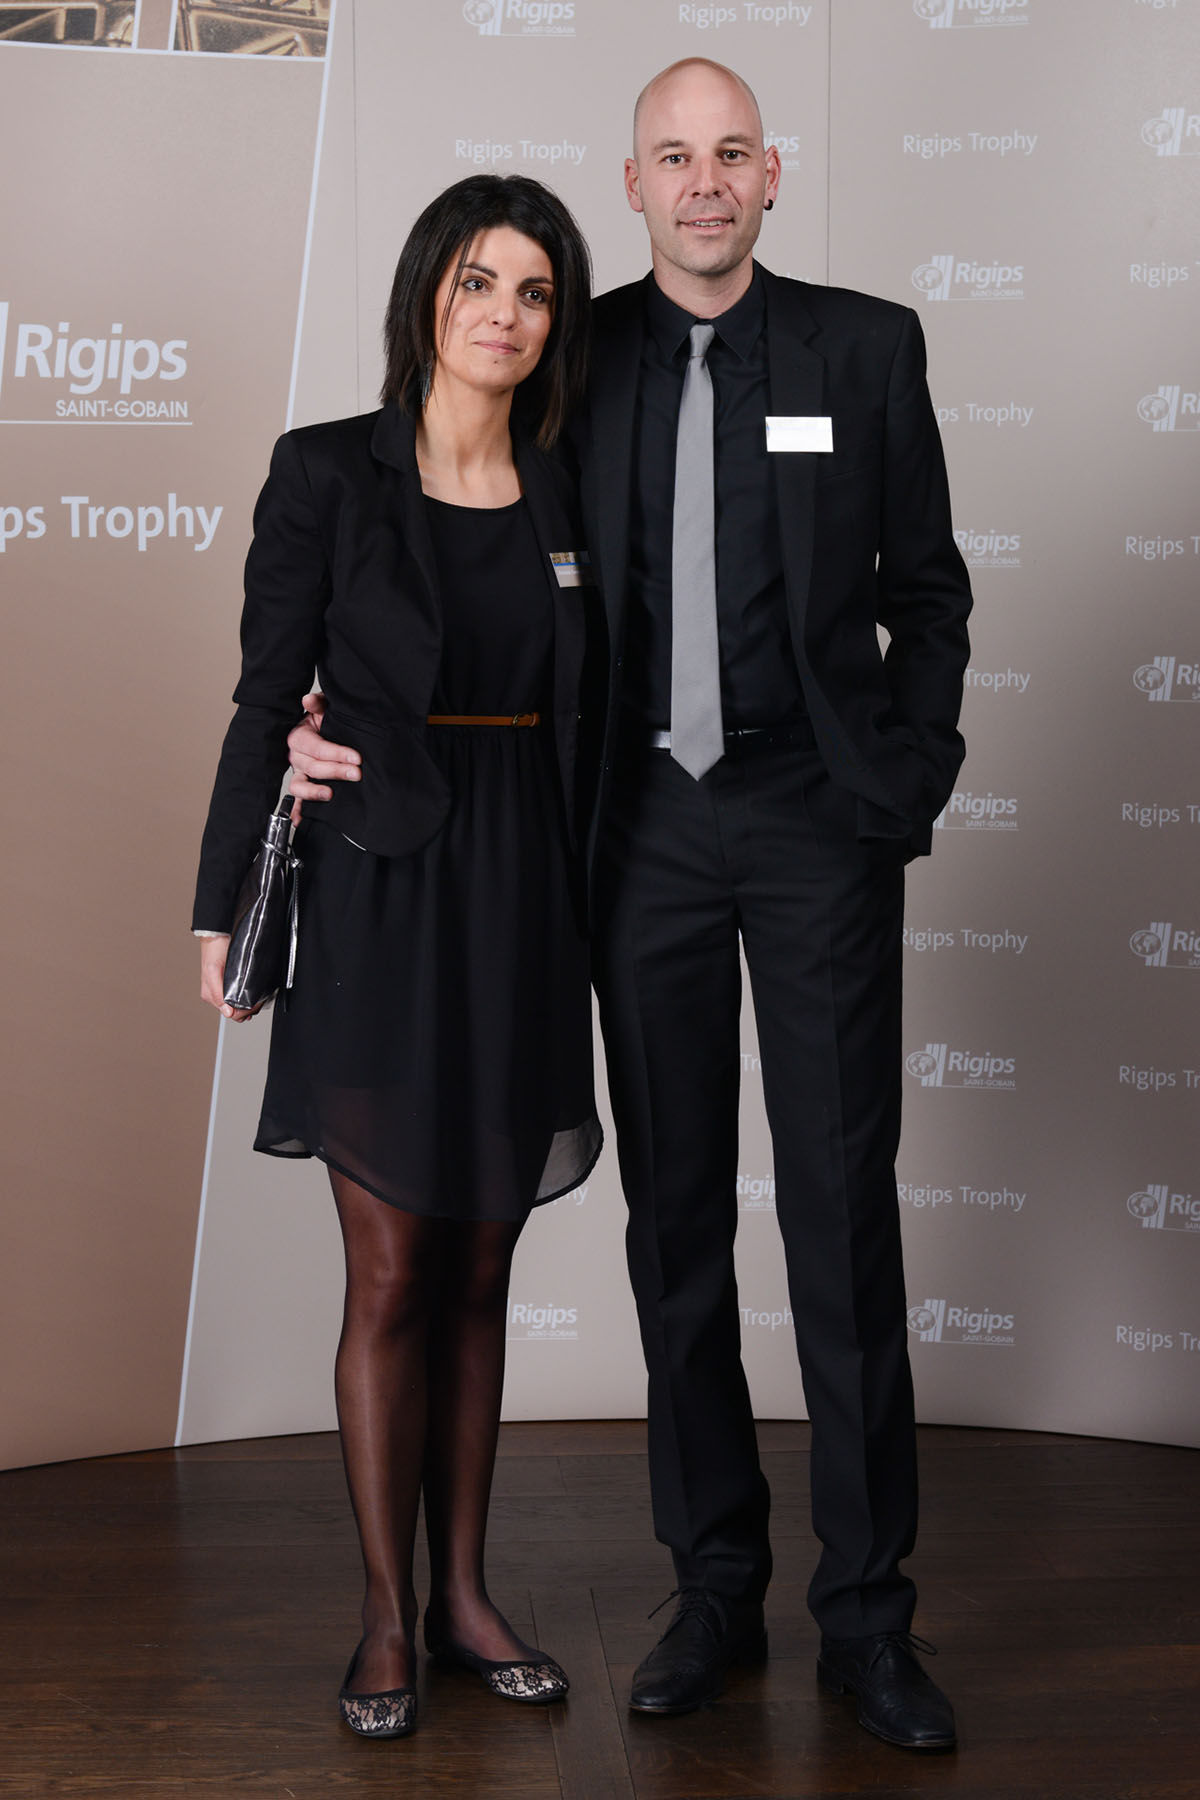 Rigips Trophy 16_0091